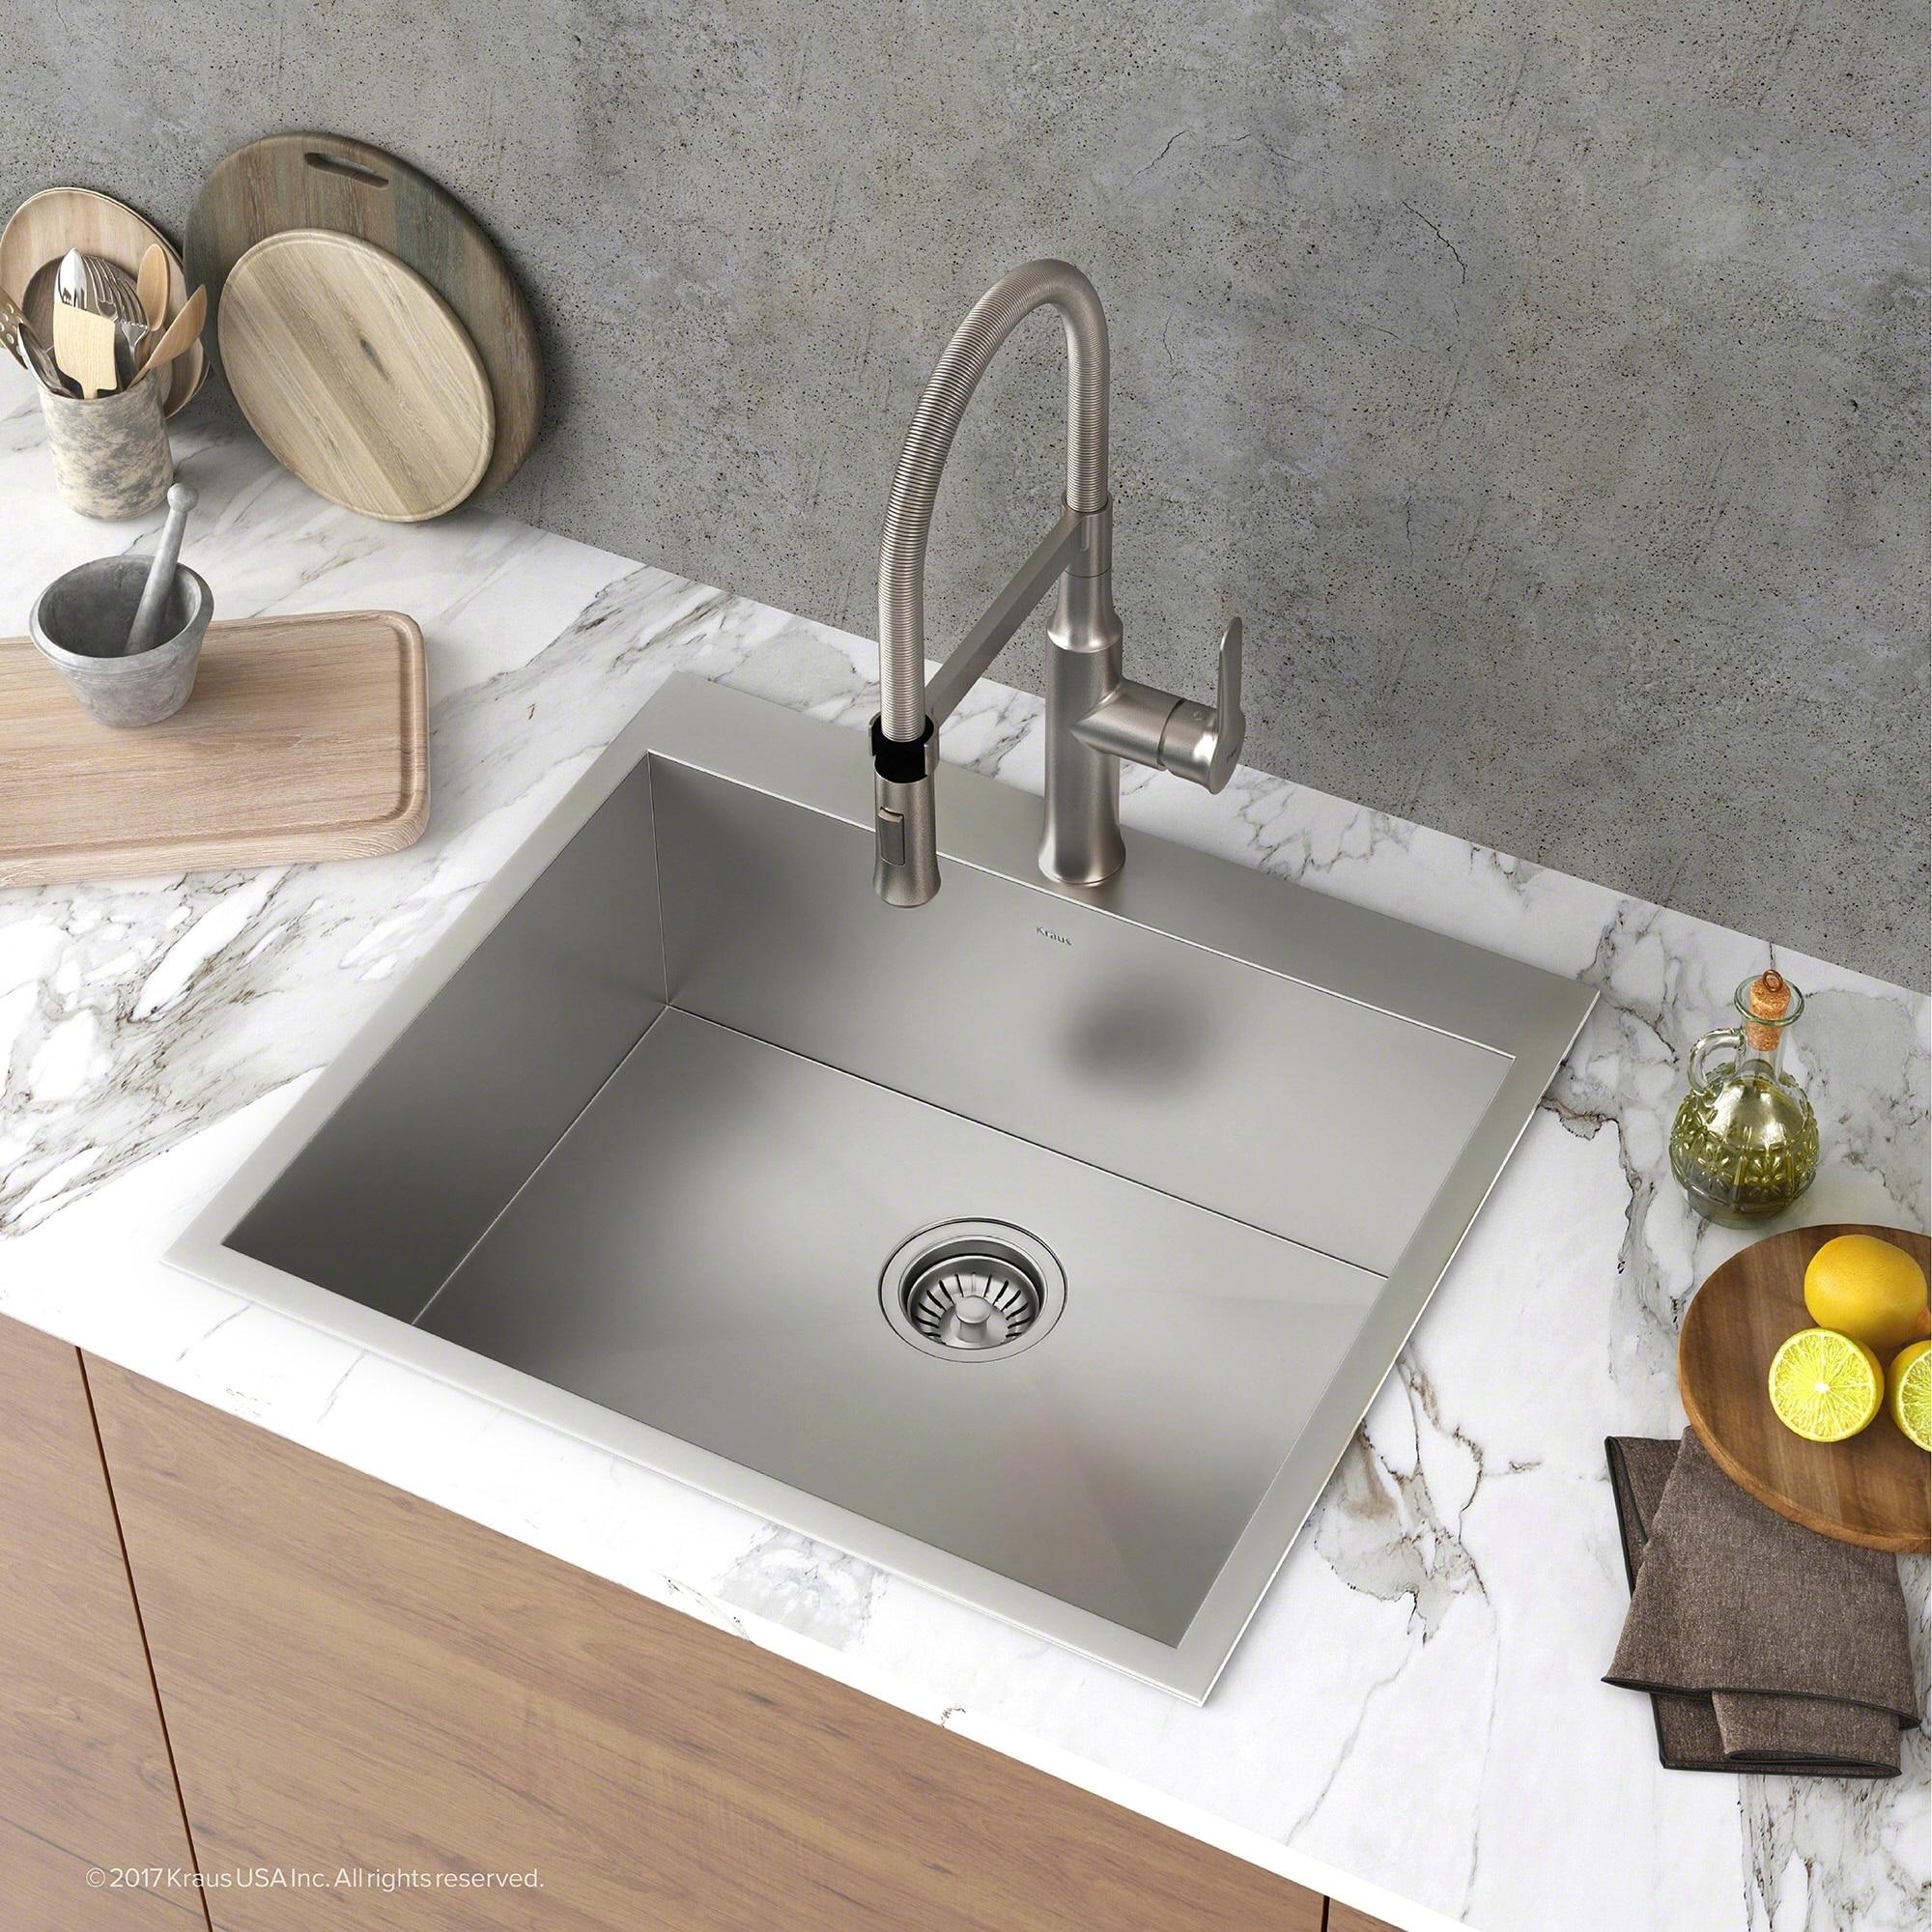 Kraus KP1TS25S-1 Pax 25 inch Drop-in Stainless Steel Kitchen Sink